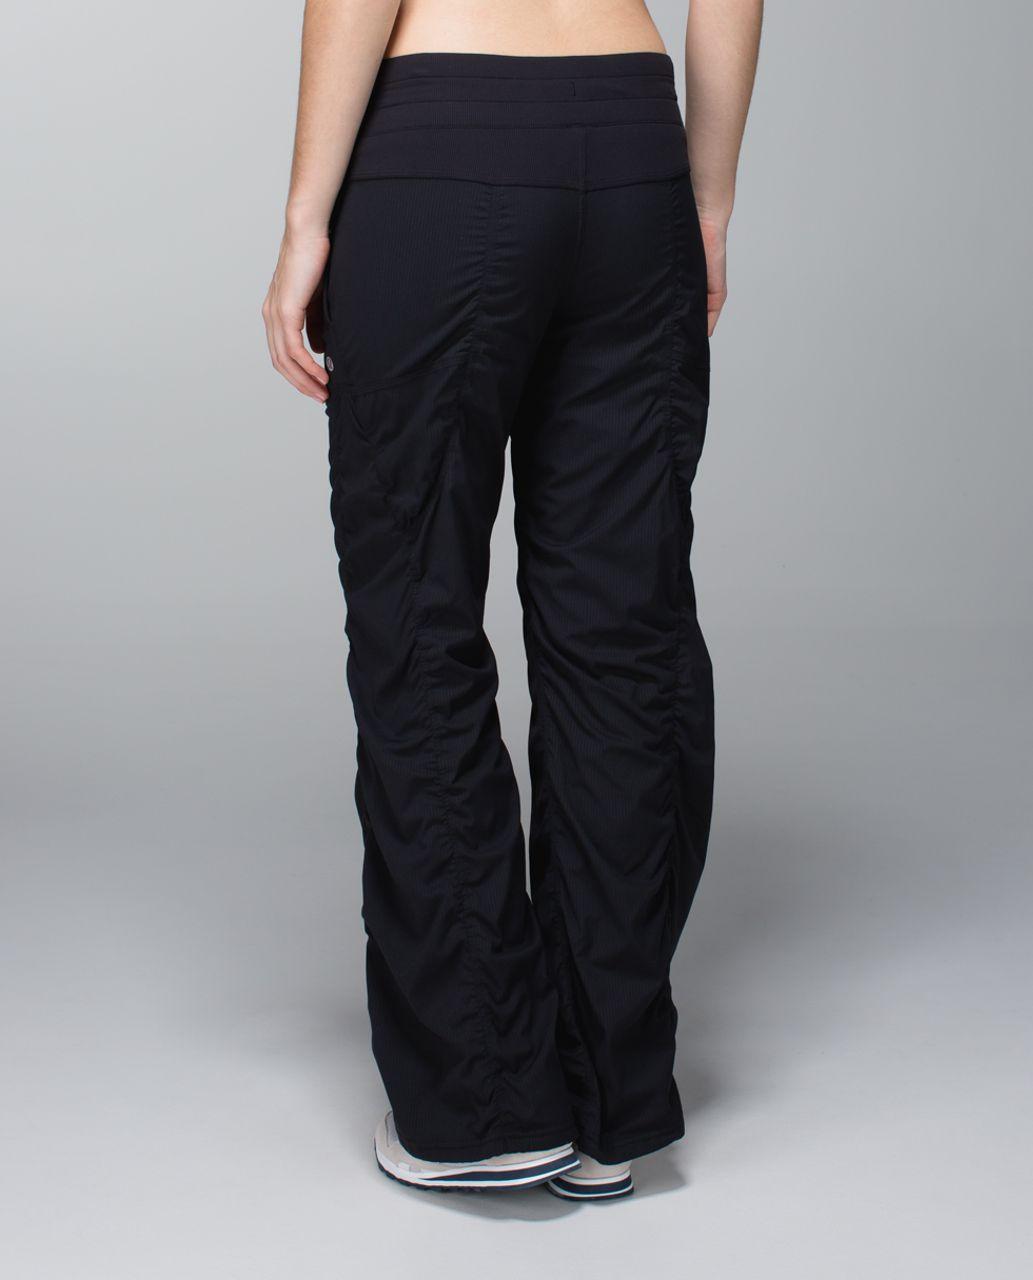 24067949e Lululemon Studio Pant II (Tall) (Lined) - Black - lulu fanatics